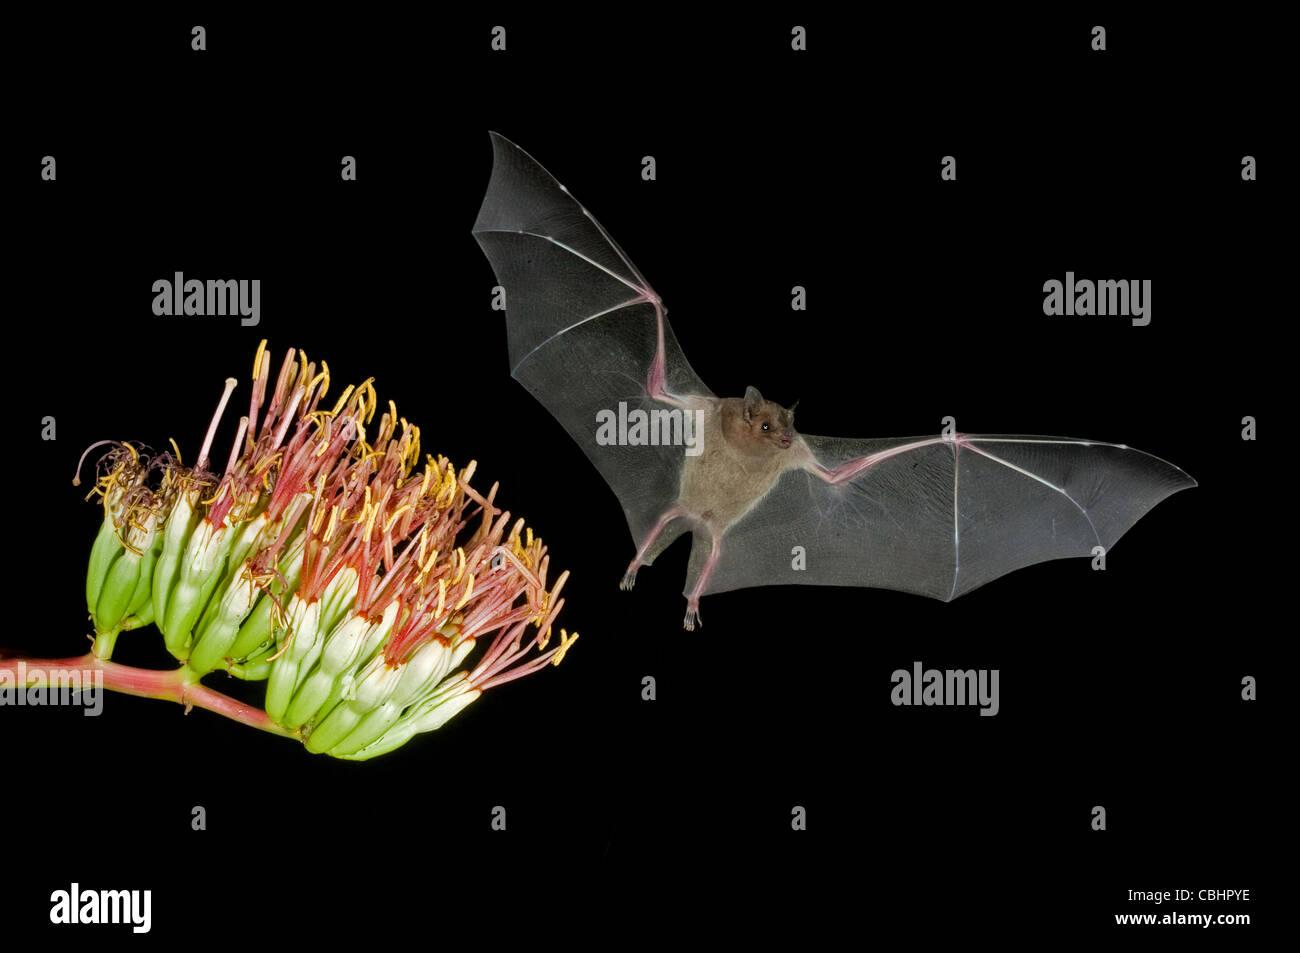 Geringerem langnasigen Bat Leptonycteris Curasoae Amado, ARIZONA, USA 23 August Erwachsenen Parrys Agave Blumen. Stockbild